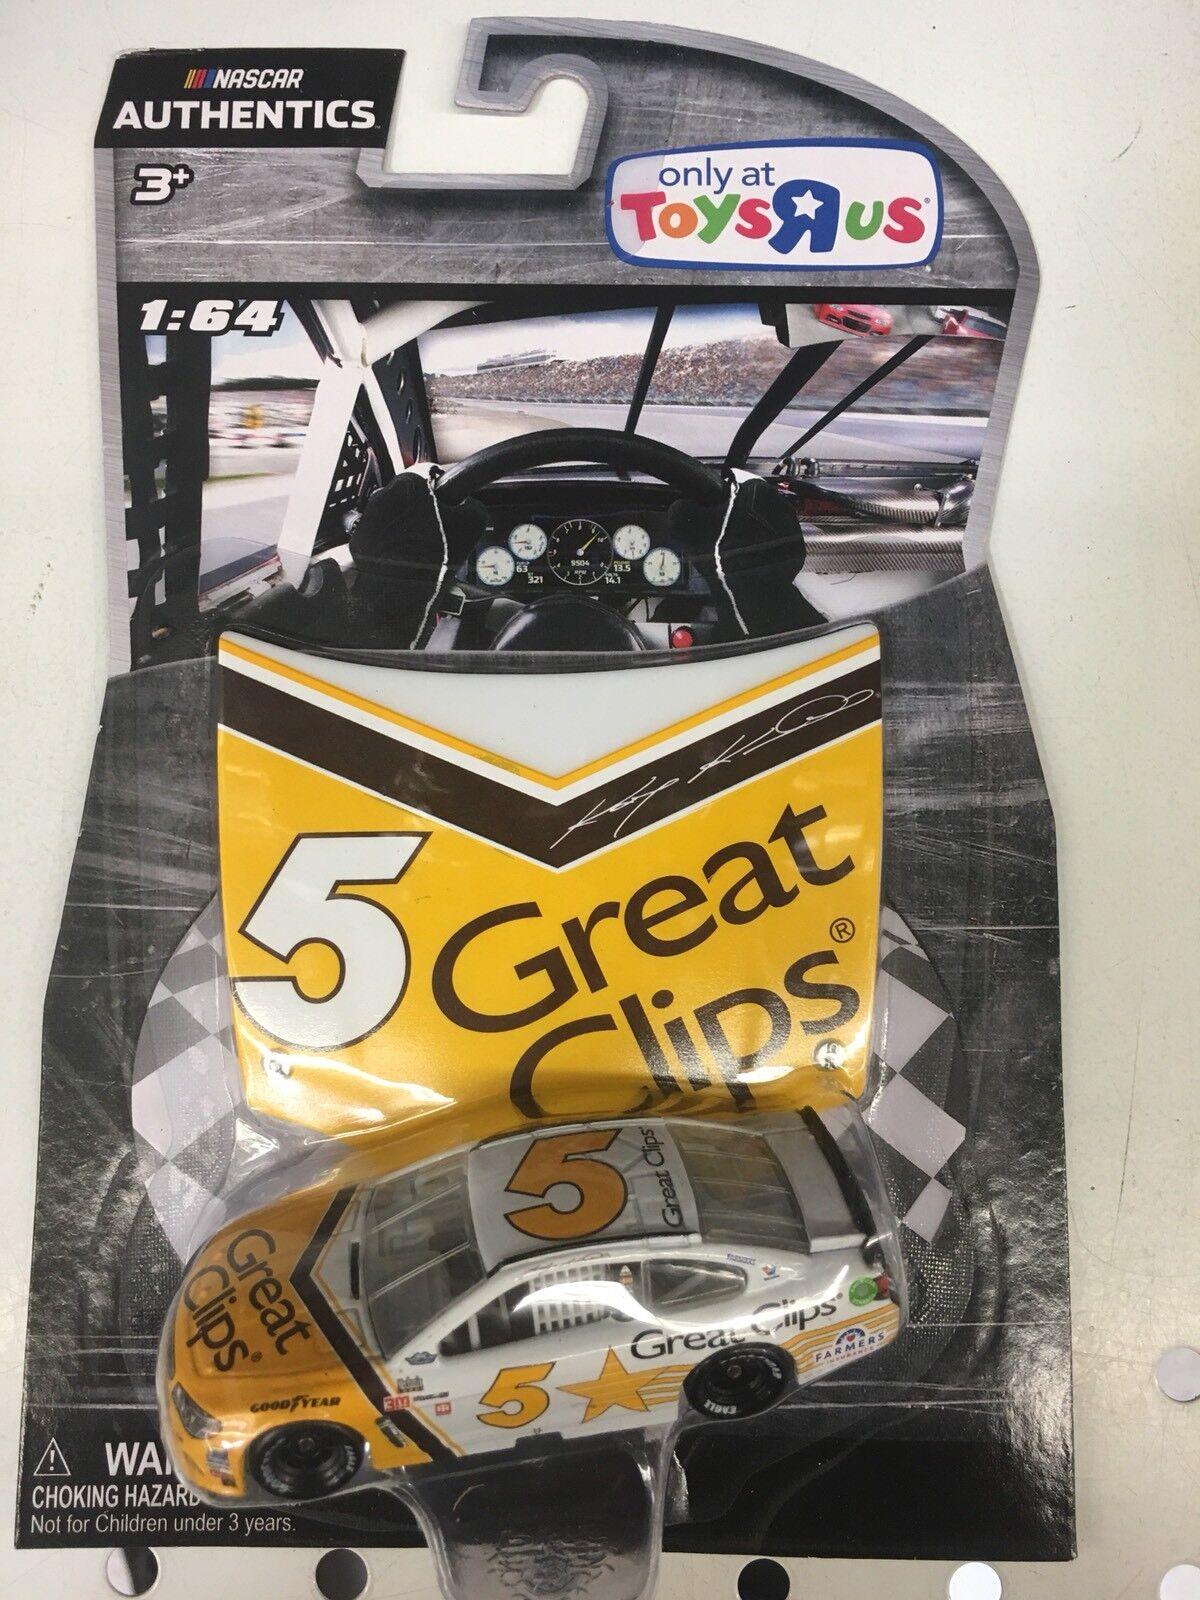 NASCAR AUTHENTICS 2017 KASEY KHANE GREAT CLIPS 1 64 DIECAST DARLINGTON SERIES